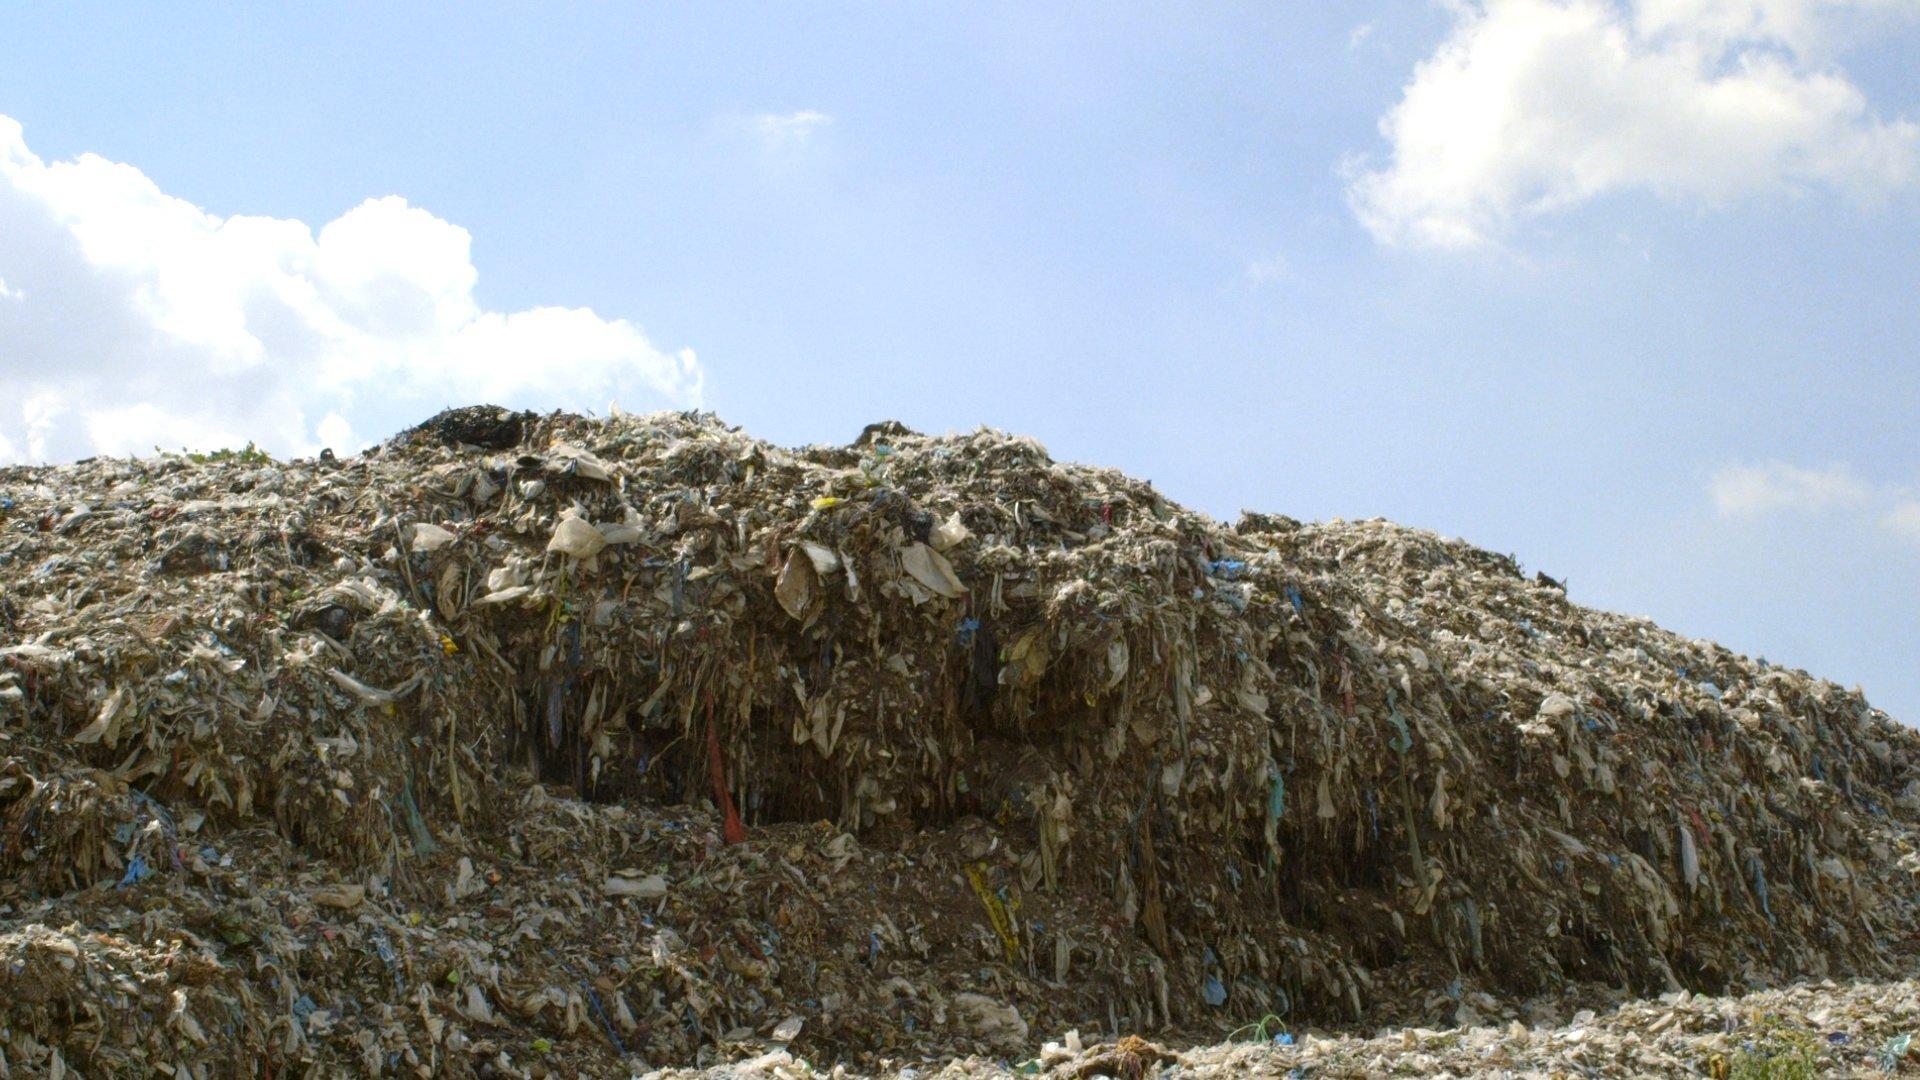 Scraps of clothes sitting in landfills.